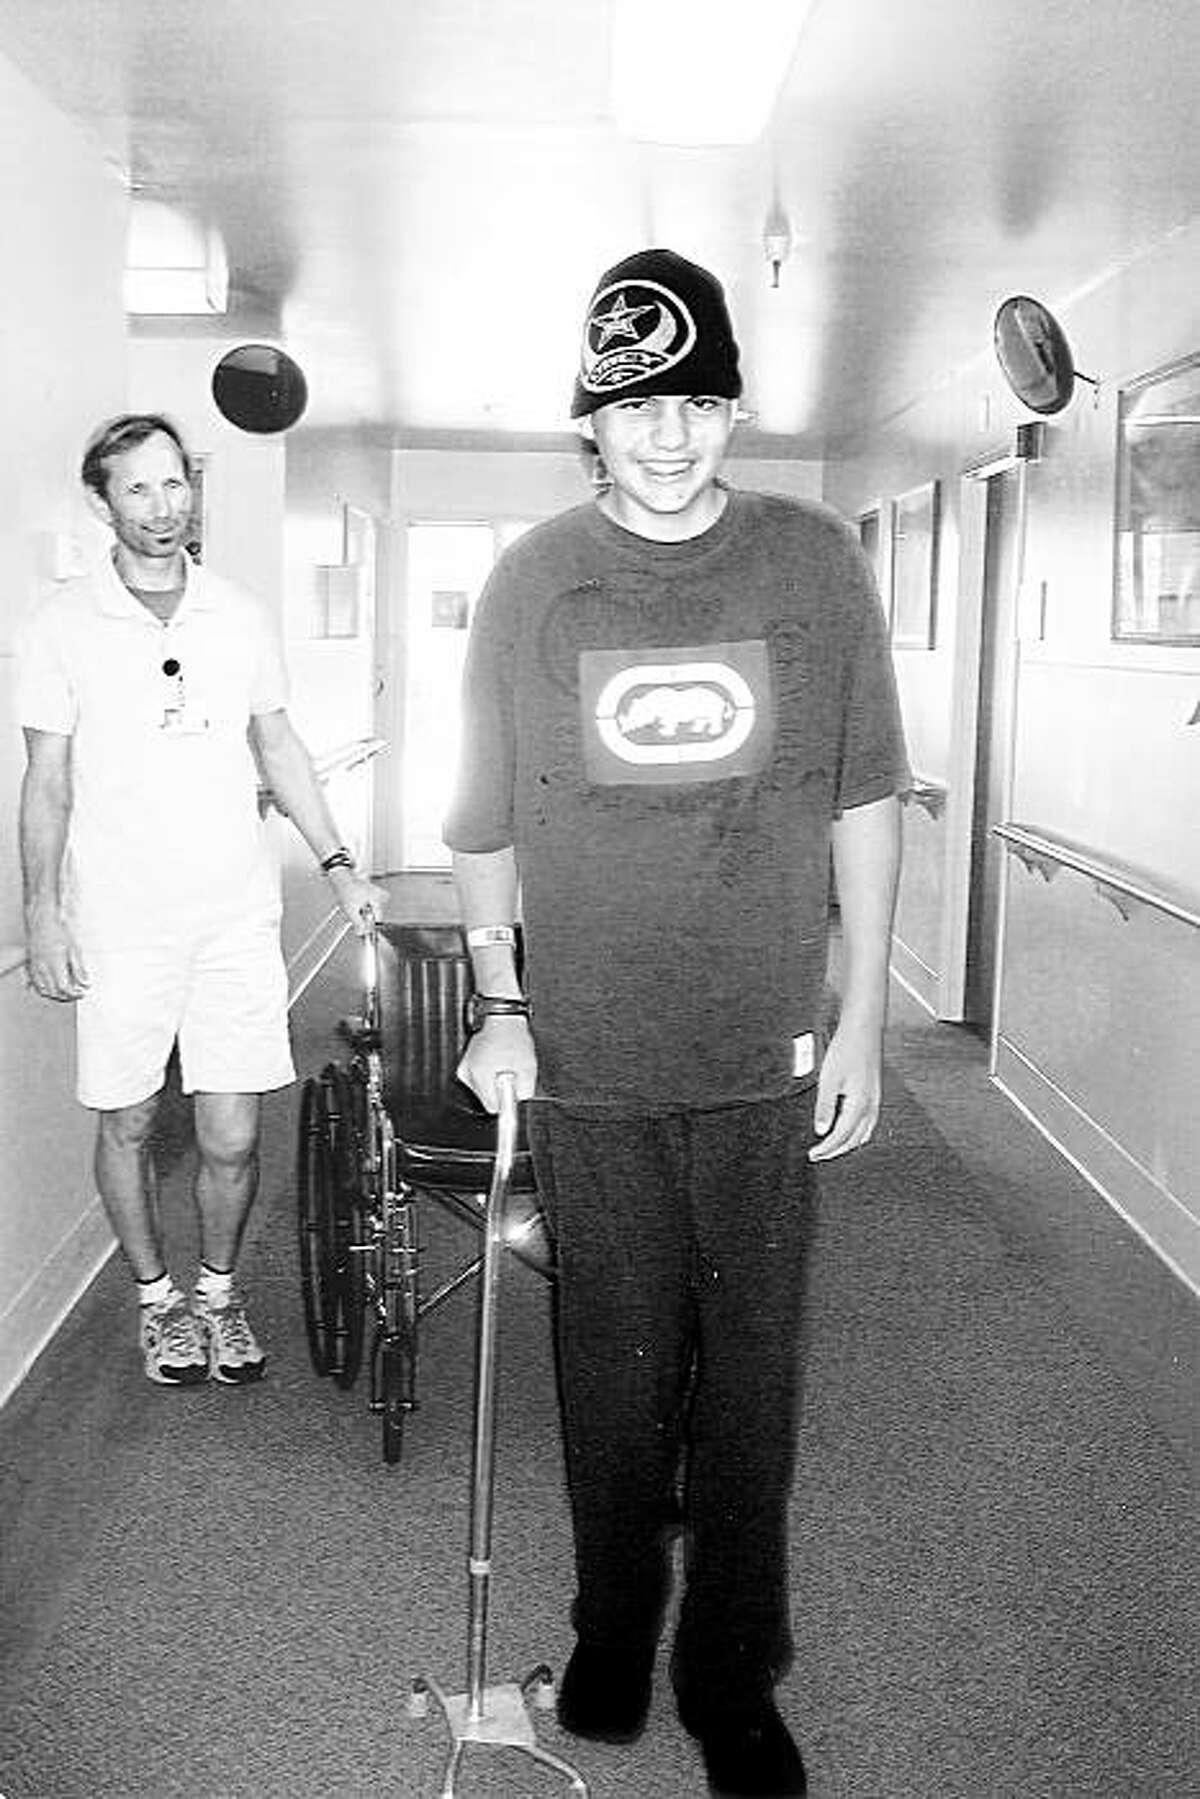 Ryan Tompkins at the Kentfield Rehabilitation Hospital in October 2006